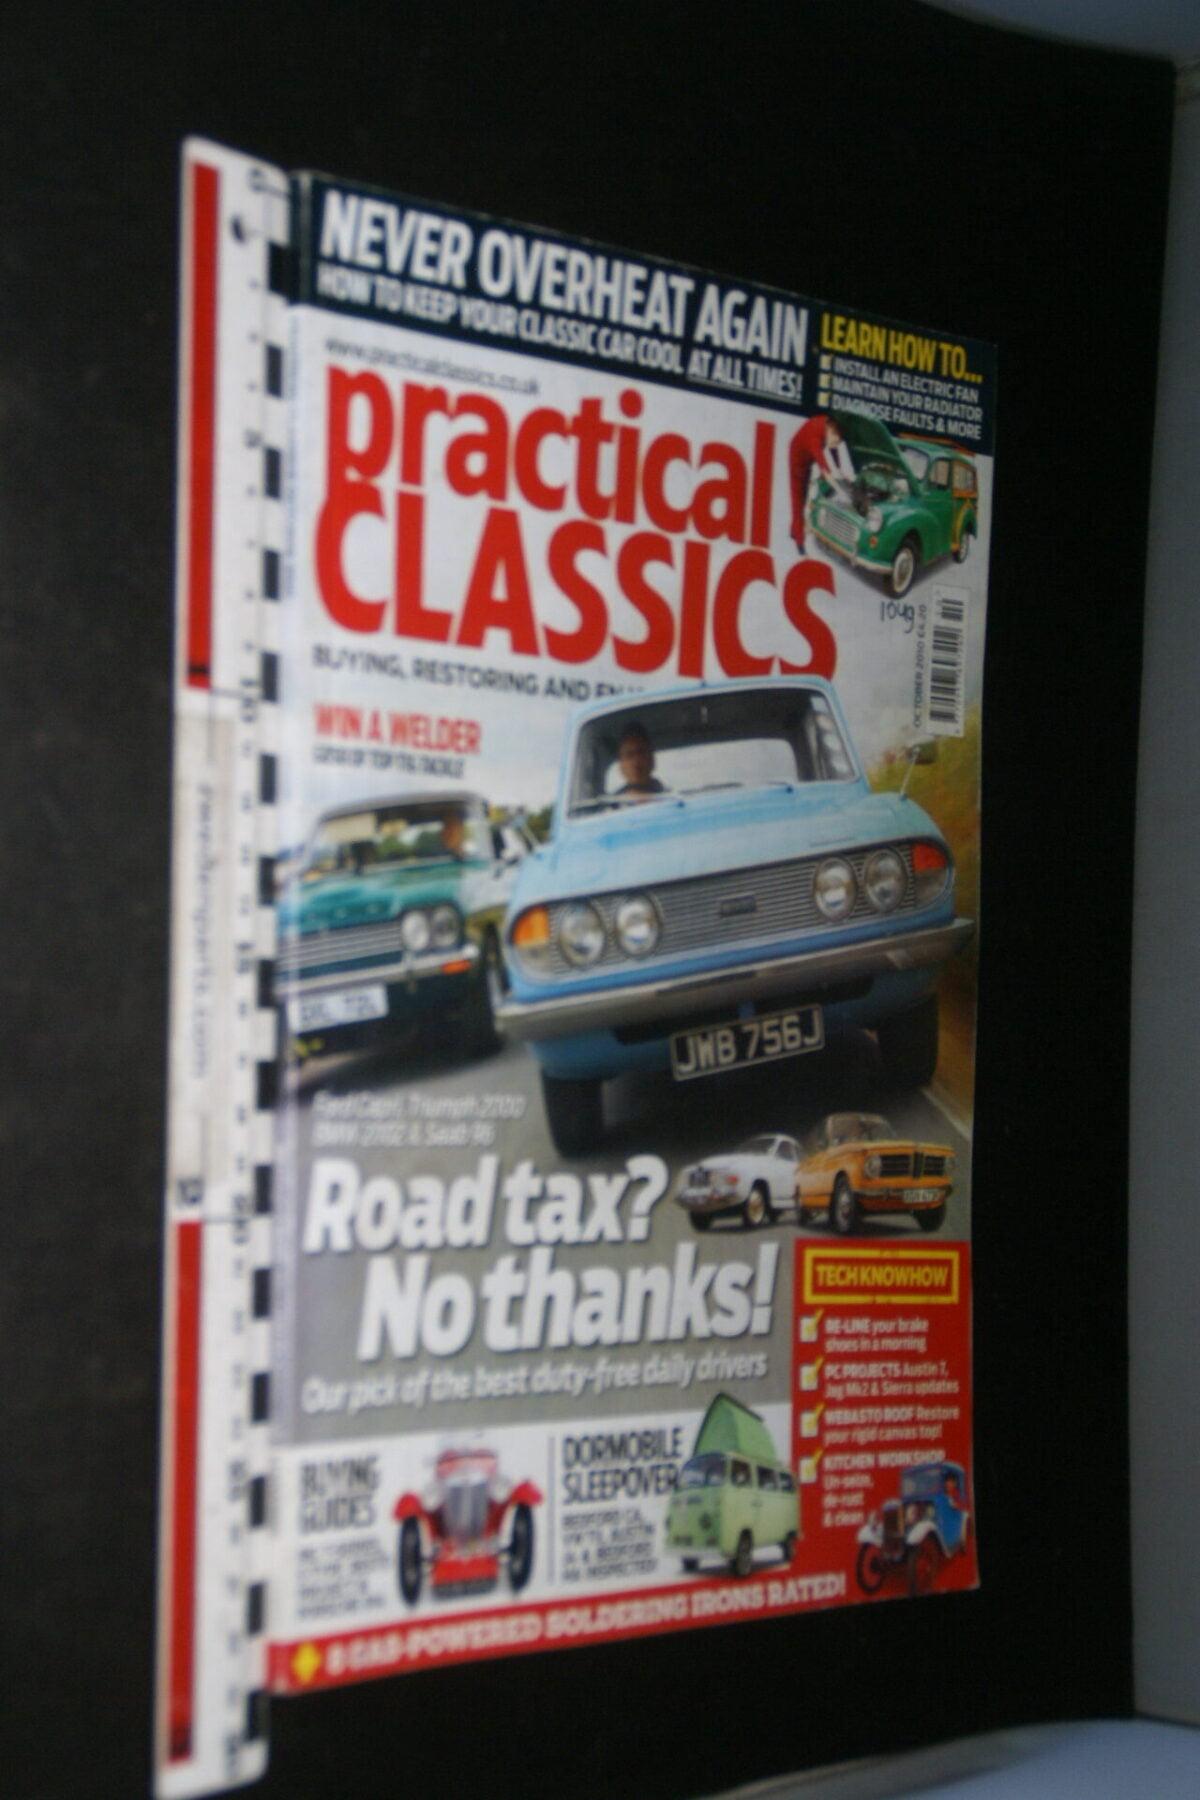 DSC07370 2010 oktober tijdschrift Practical Classics-7ee844a3